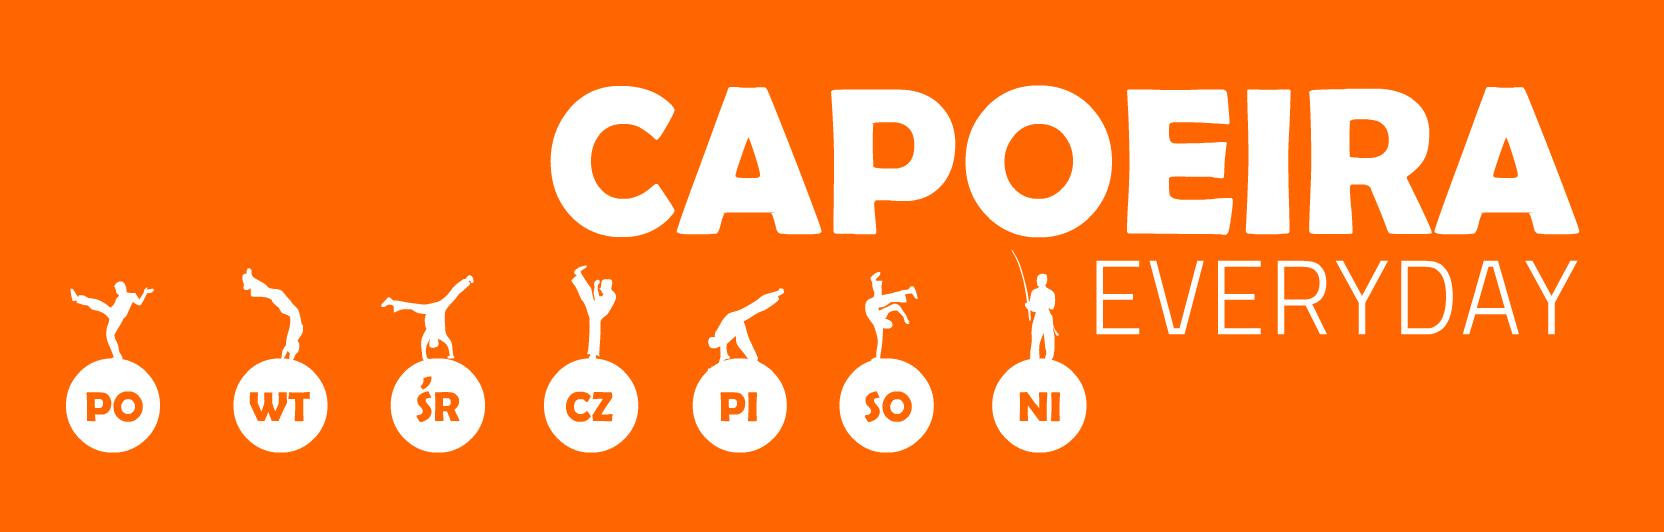 capoeira_everyday_yt_tyl_male